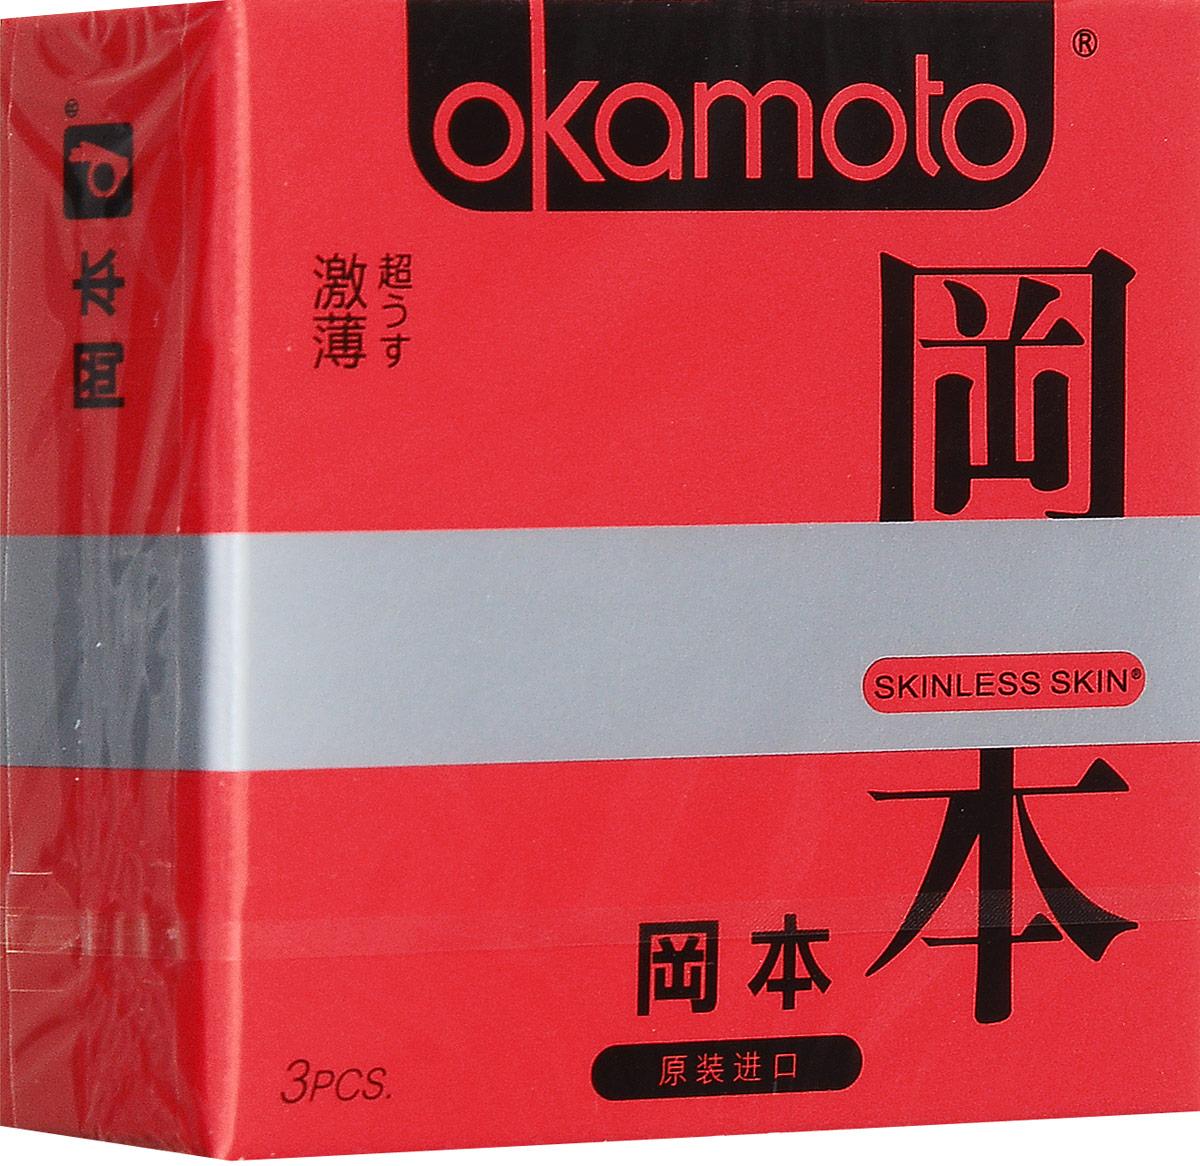 Презервативы Okamoto Skinless Skin Super Thin. 3 Ультратонкие68969/улПрезервативы Okamoto Skinless Skin Super Thin. 3 Ультратонкие